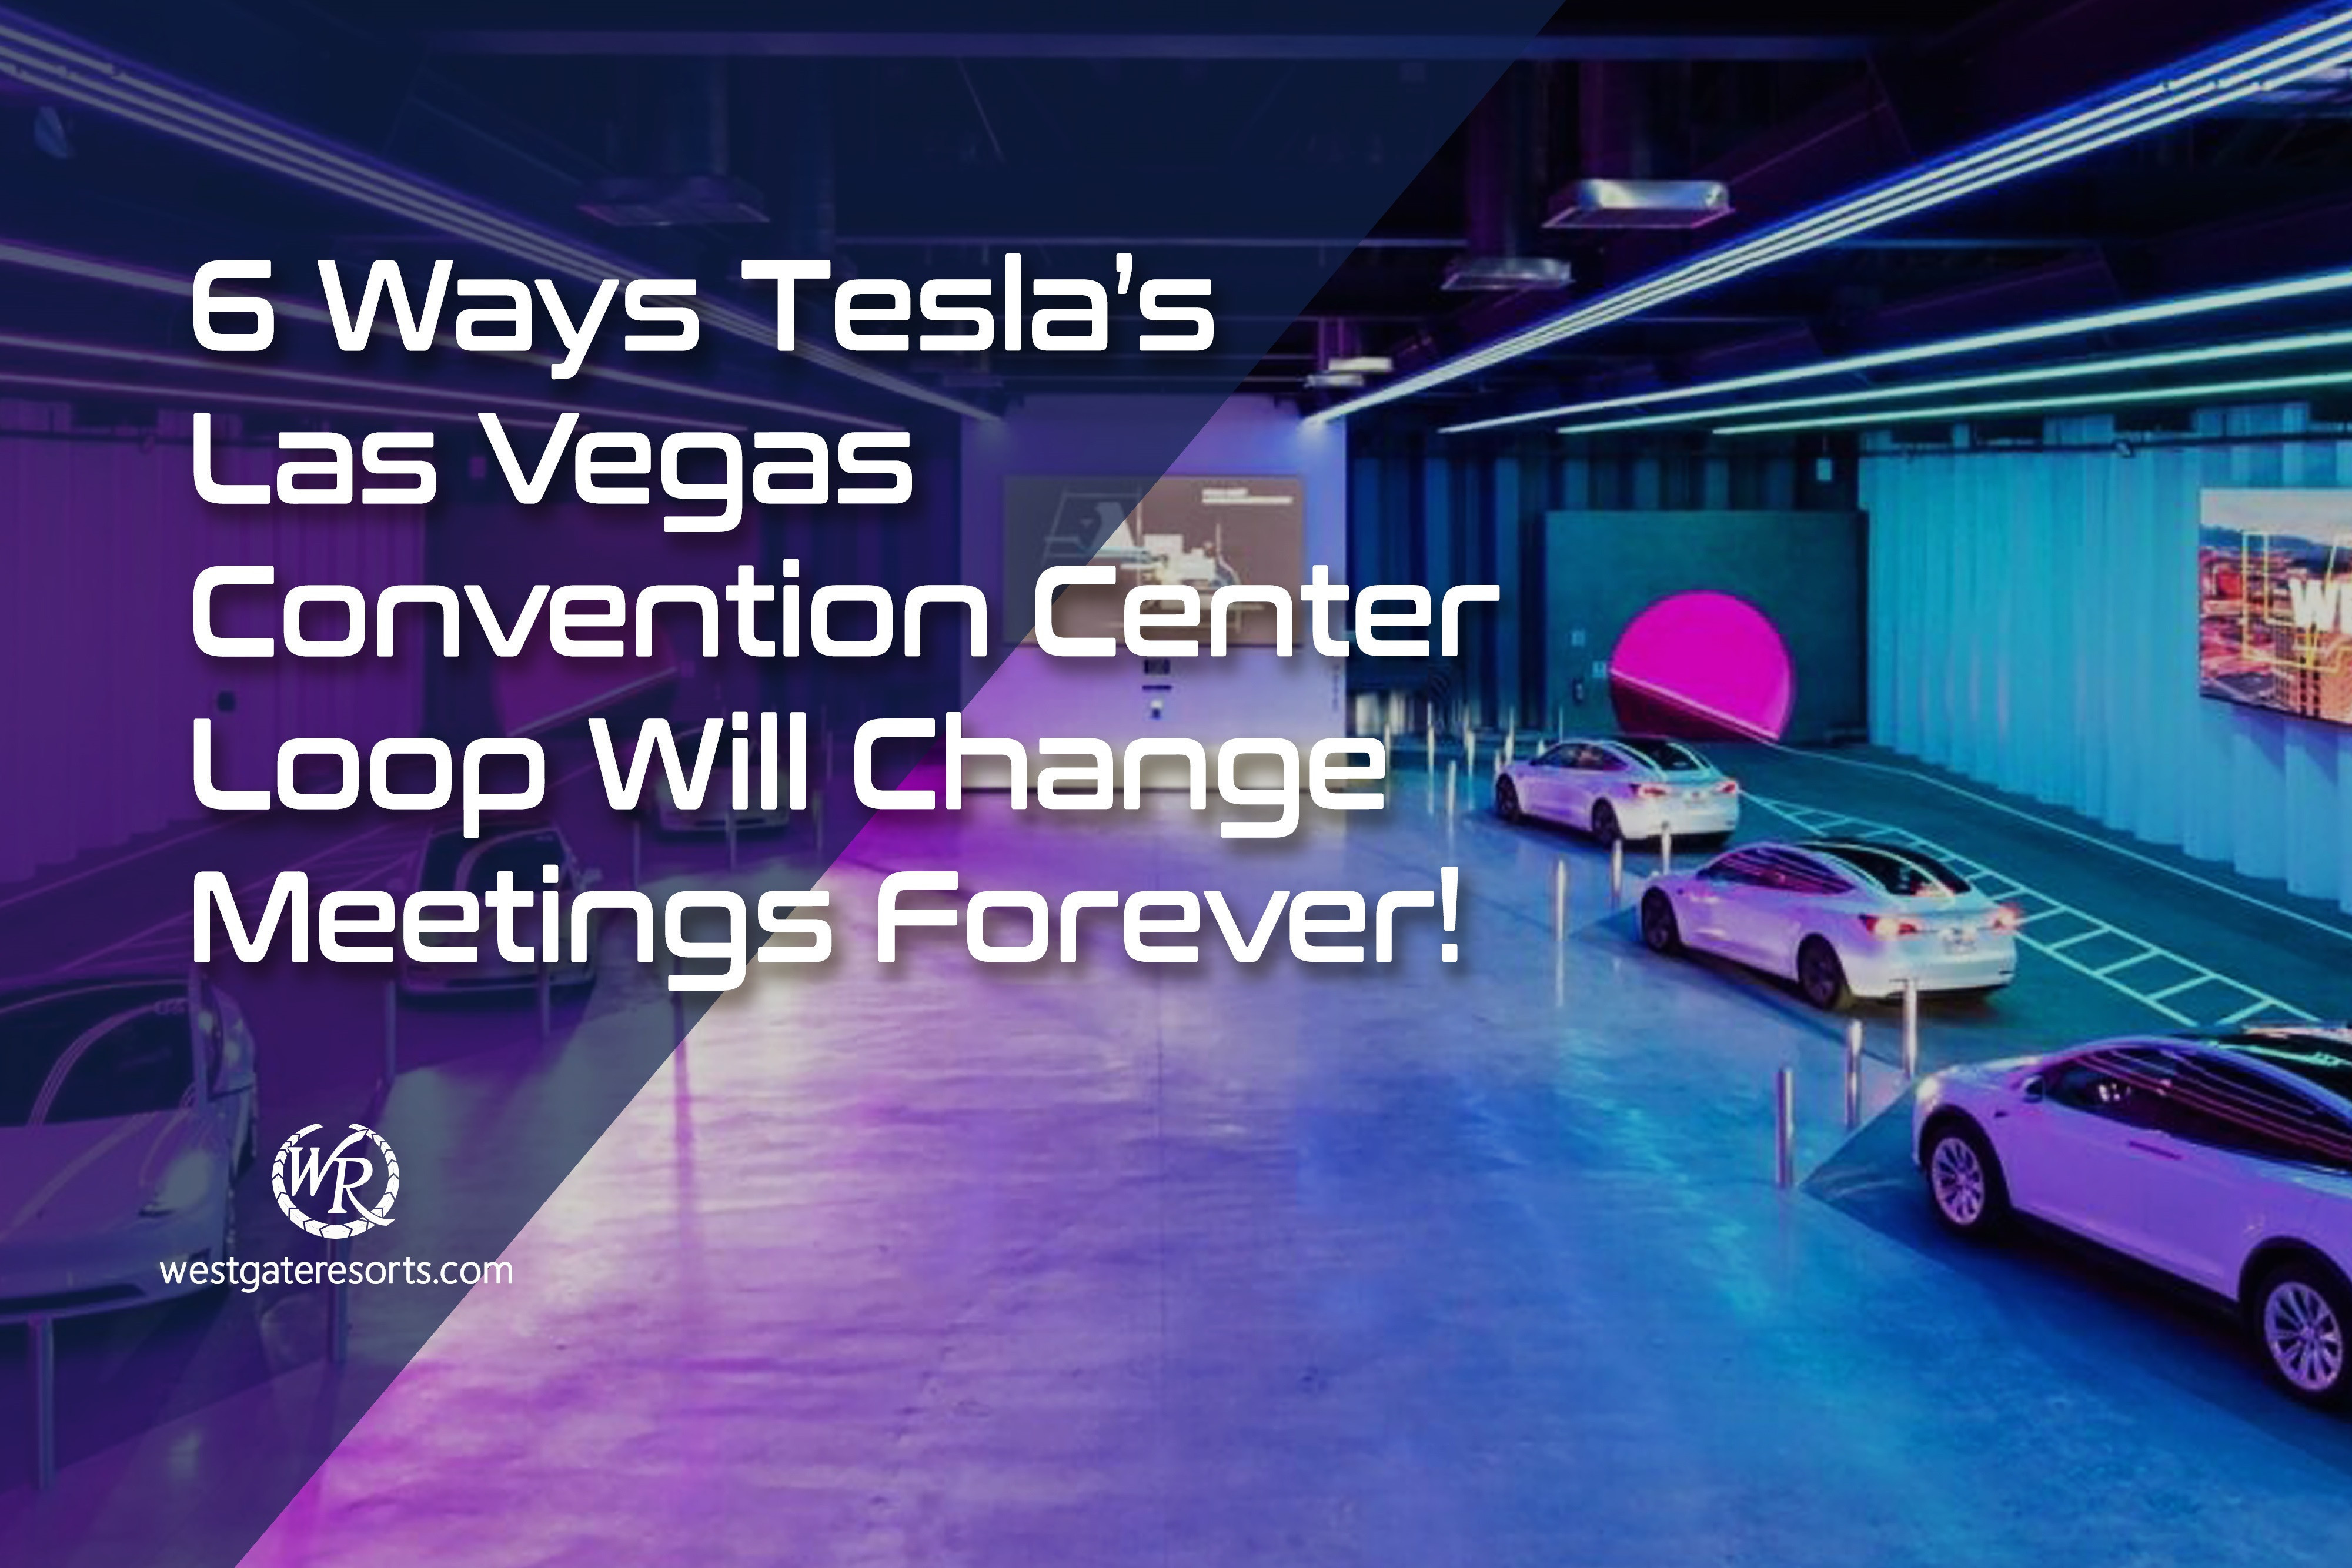 6 Ways Tesla's Las Vegas Convention Center Loop Will Change Meetings Forever!